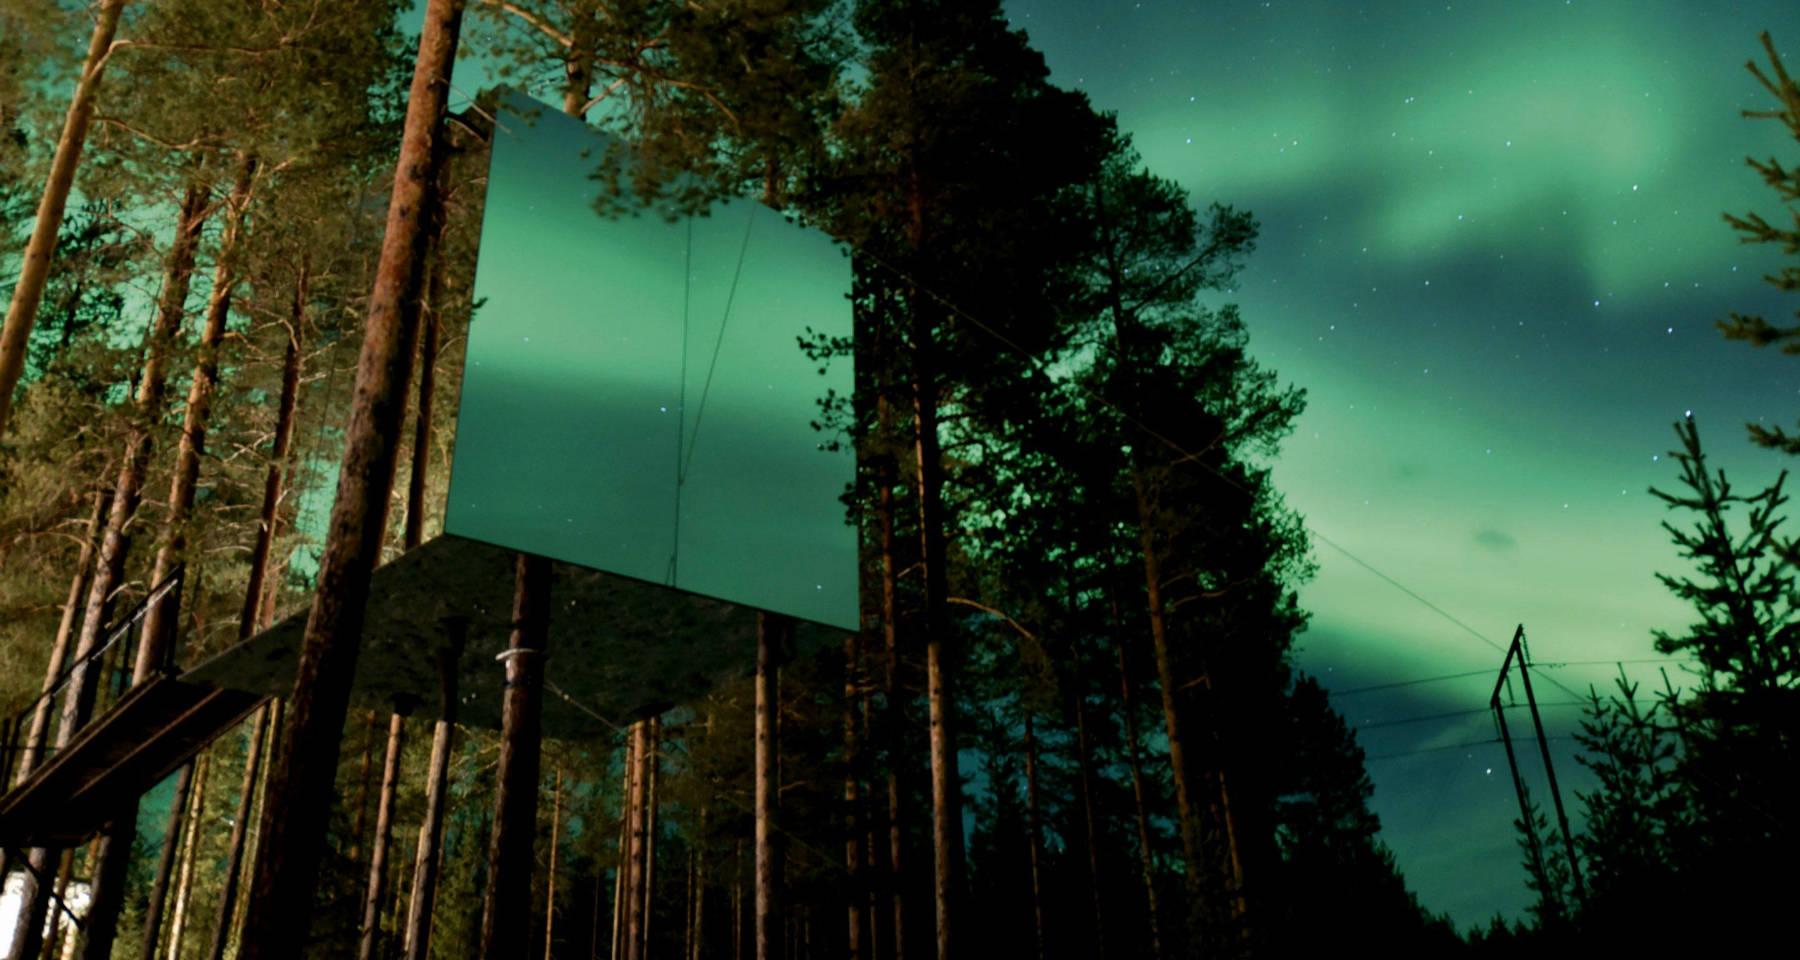 Treehotelse Home